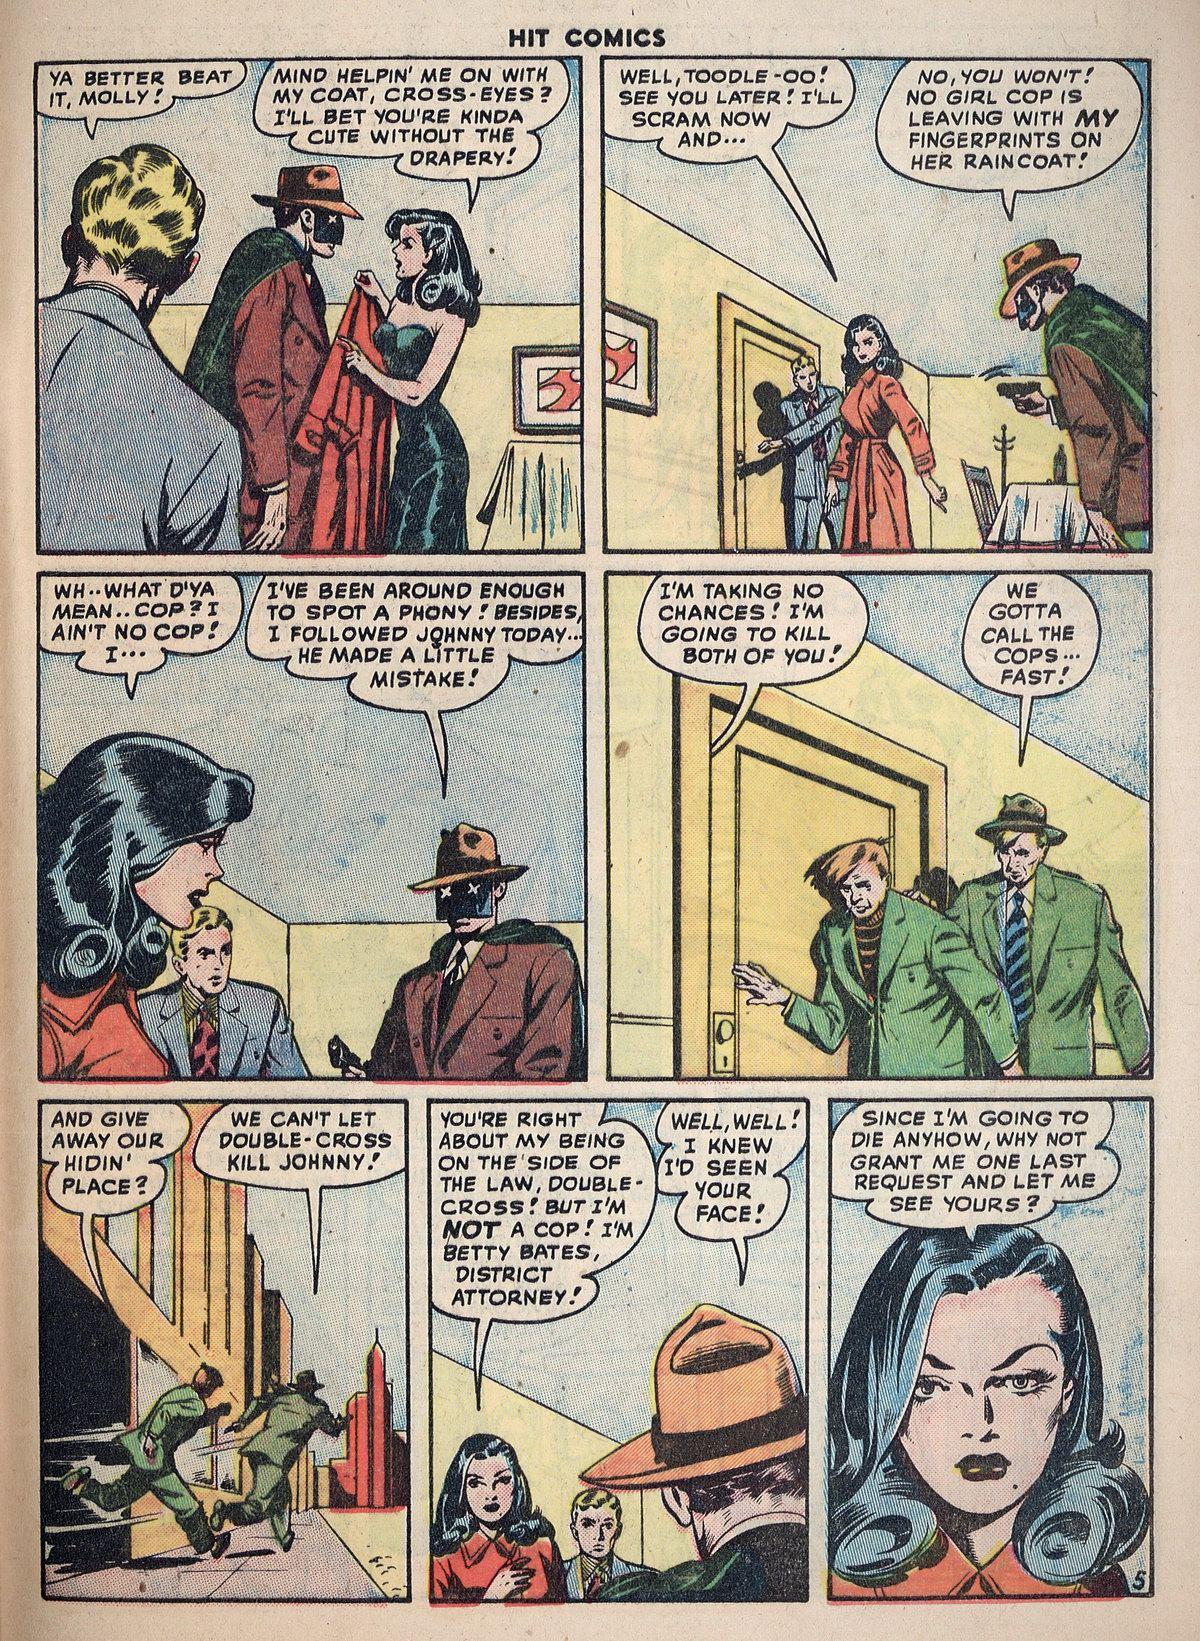 Read online Hit Comics comic -  Issue #55 - 43